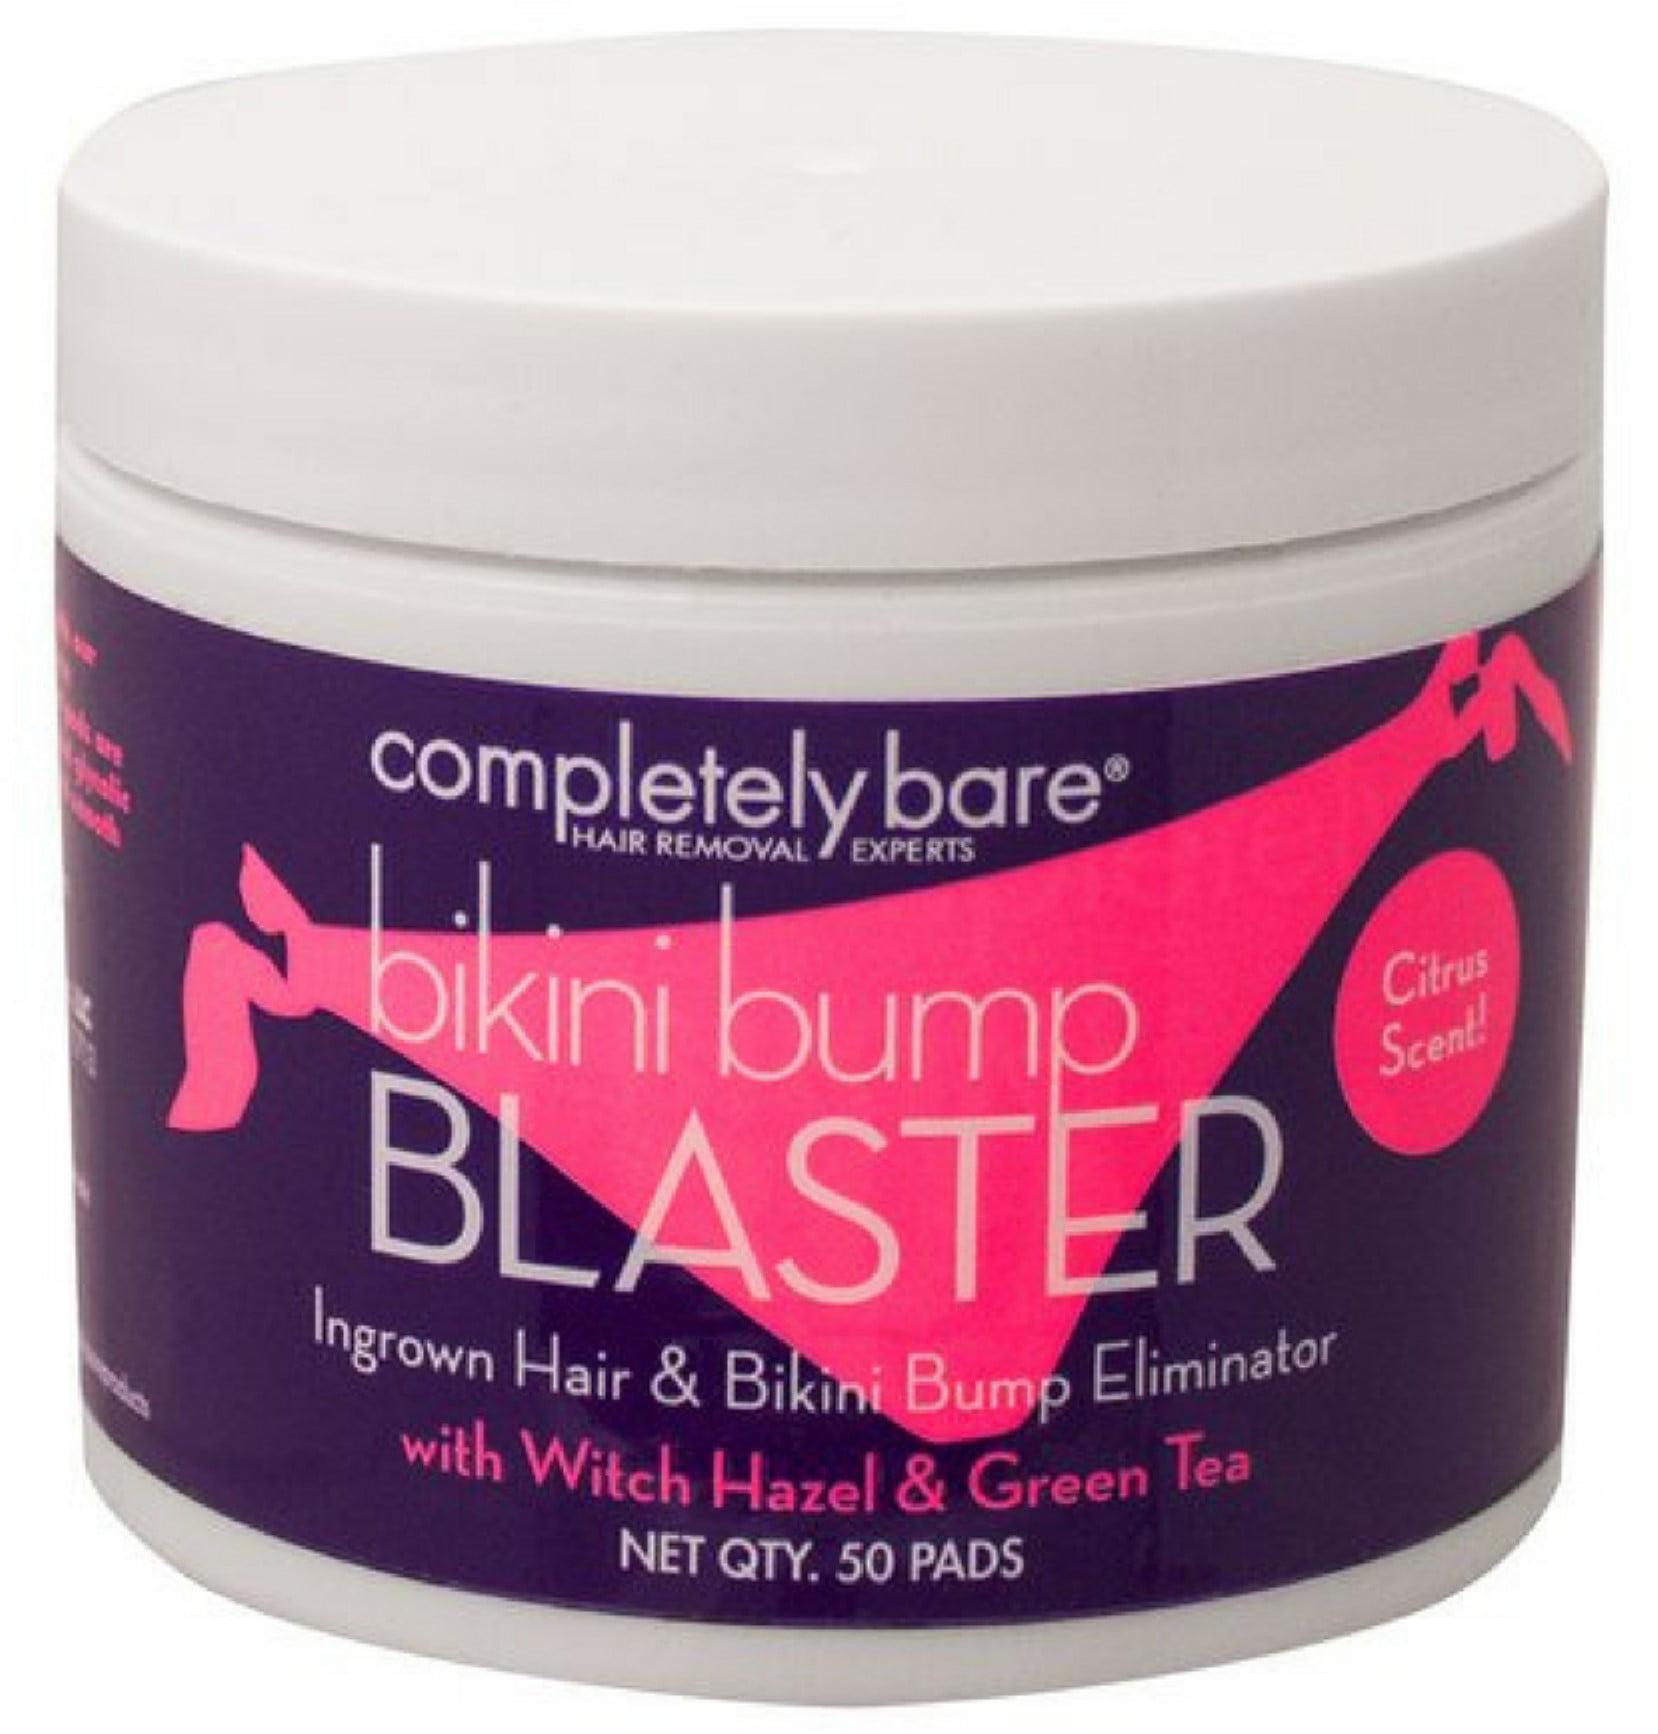 Completely Bare Bikini Bump Blaster Pads For Ingrown Hairs 50 ea